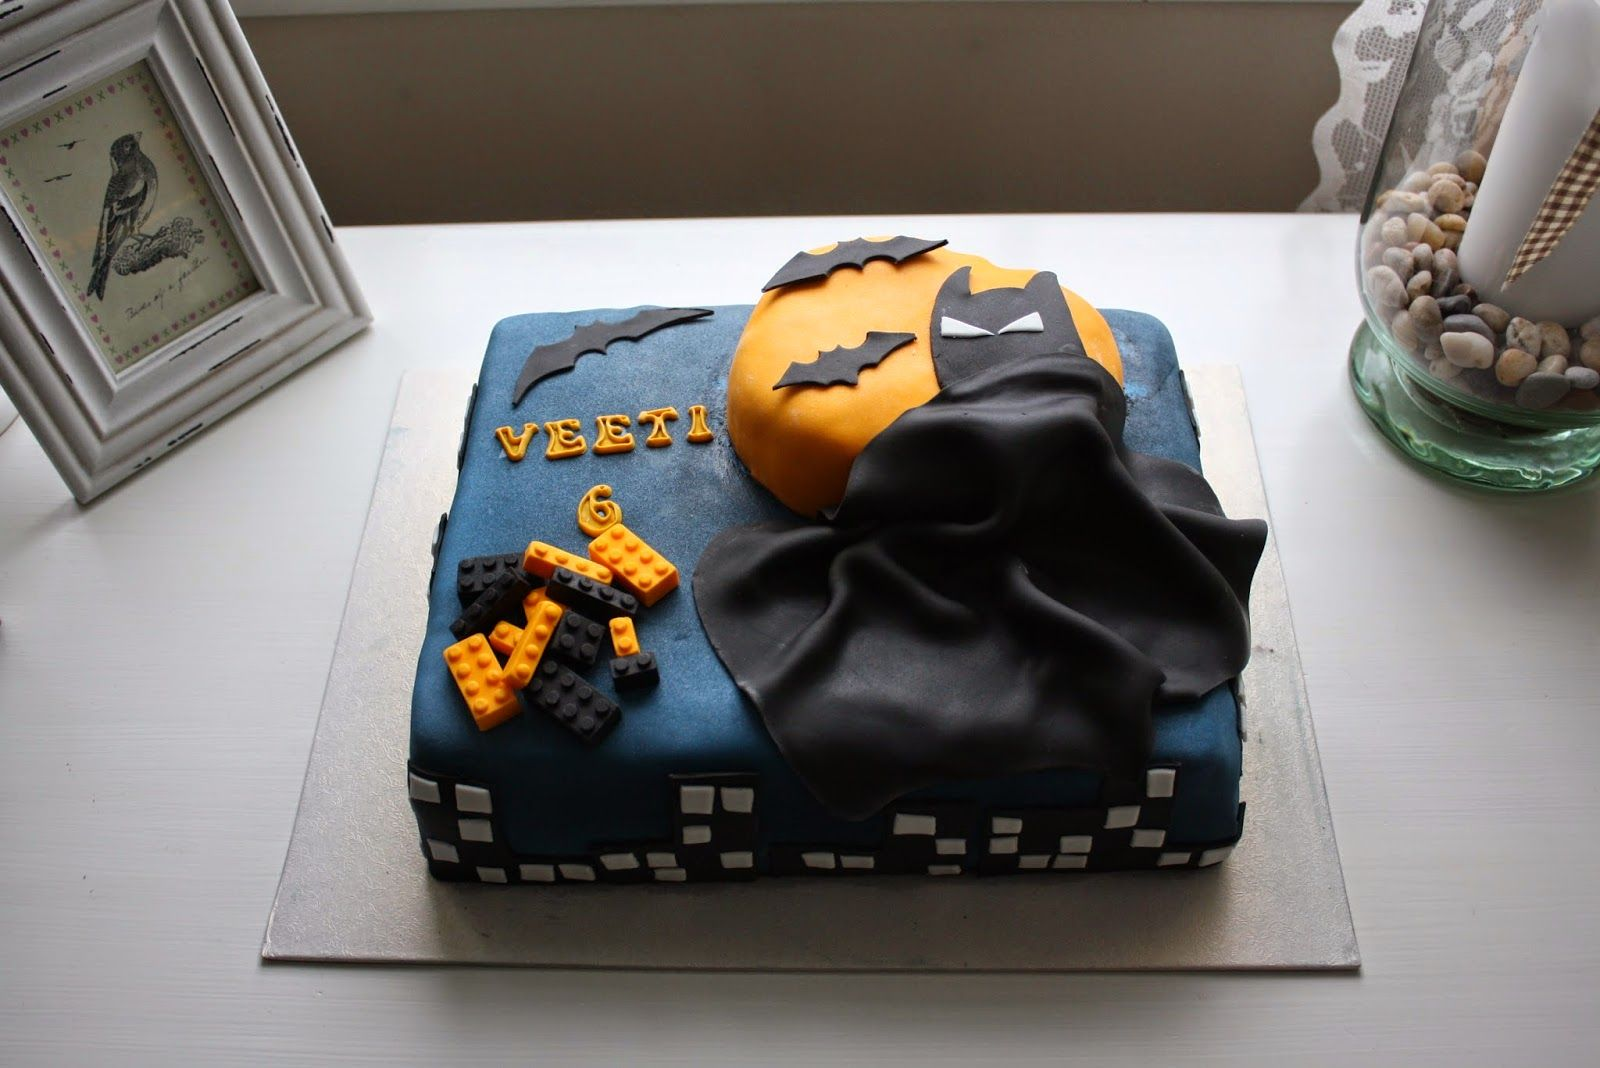 A LegoBatman inspired cake for Veeti on his 6th birthday made Nilla Hautasaari